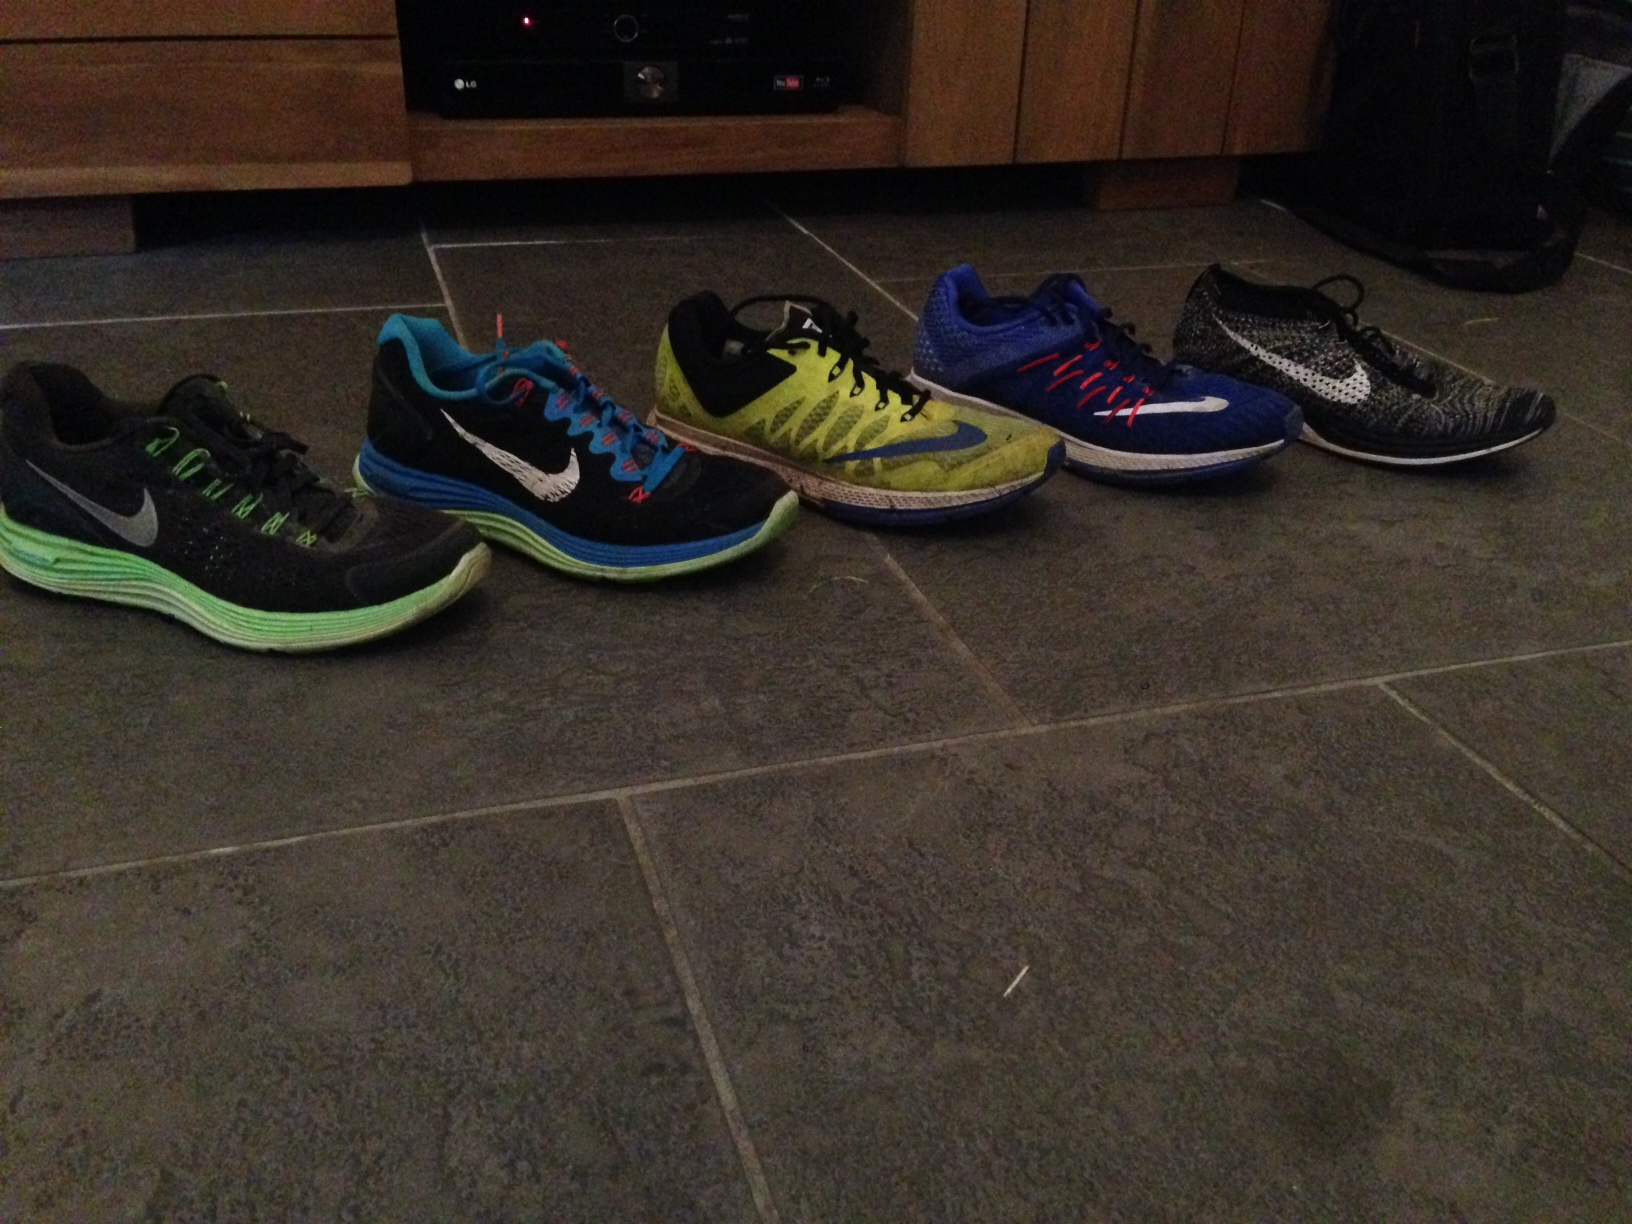 20161219-schoenen-zijaazicht